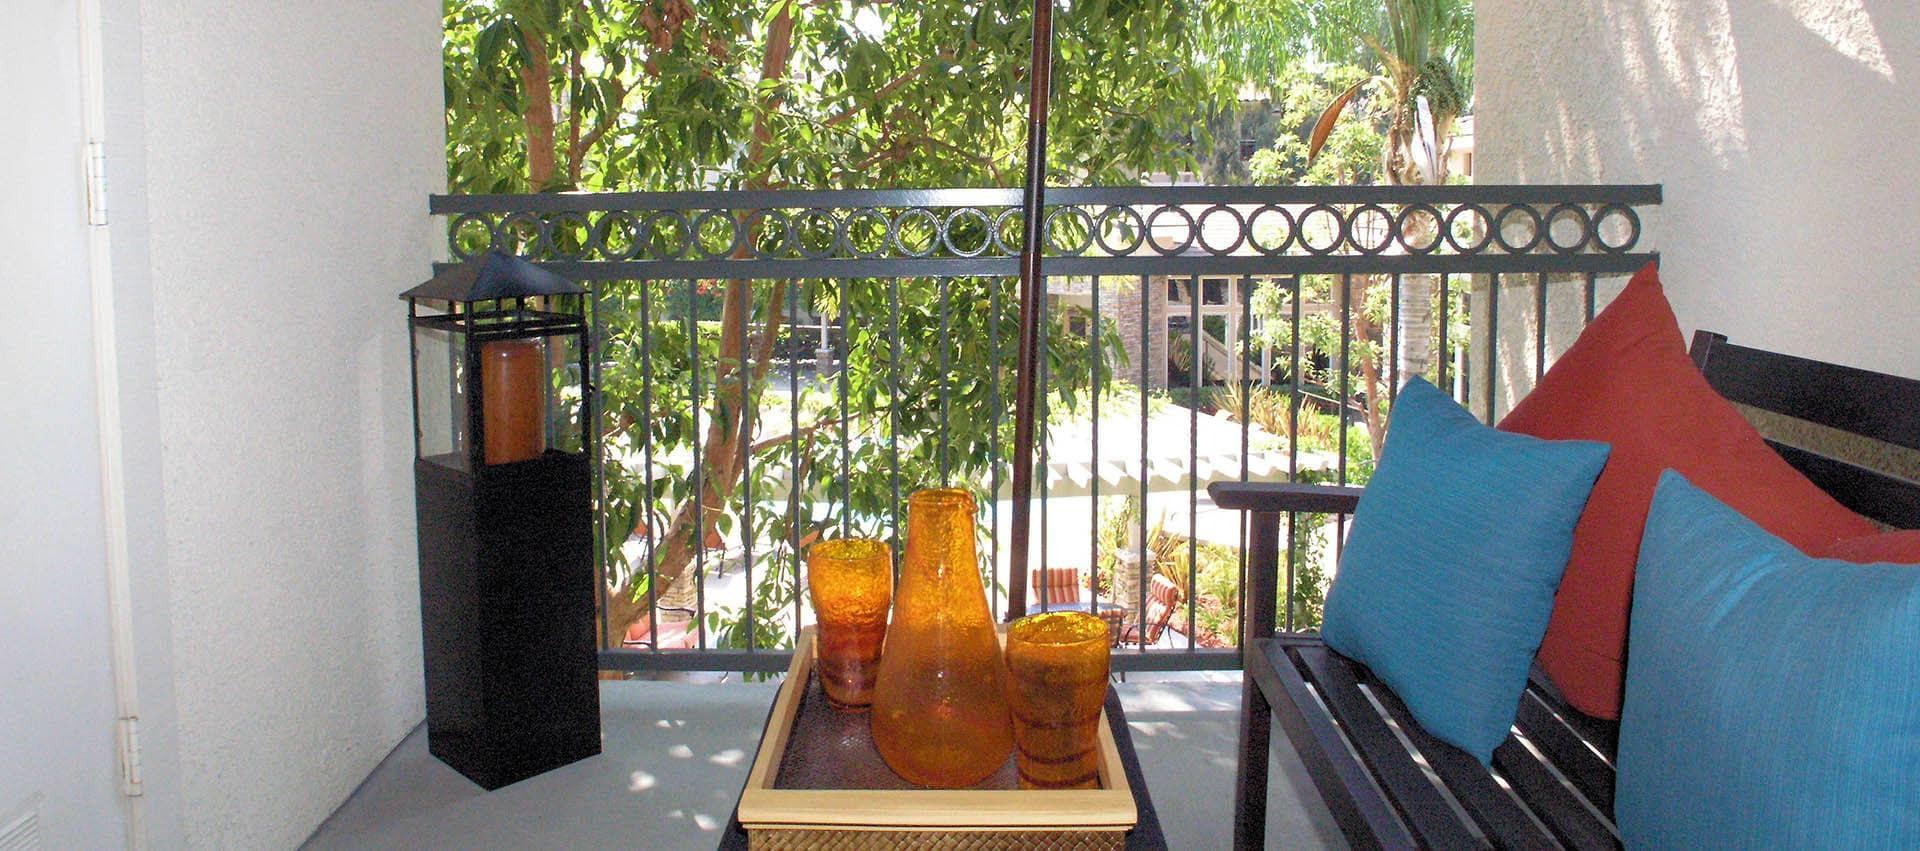 Balcony Seating Area in Alize at Aliso Viejo Apartment Homes in Aliso Viejo, California